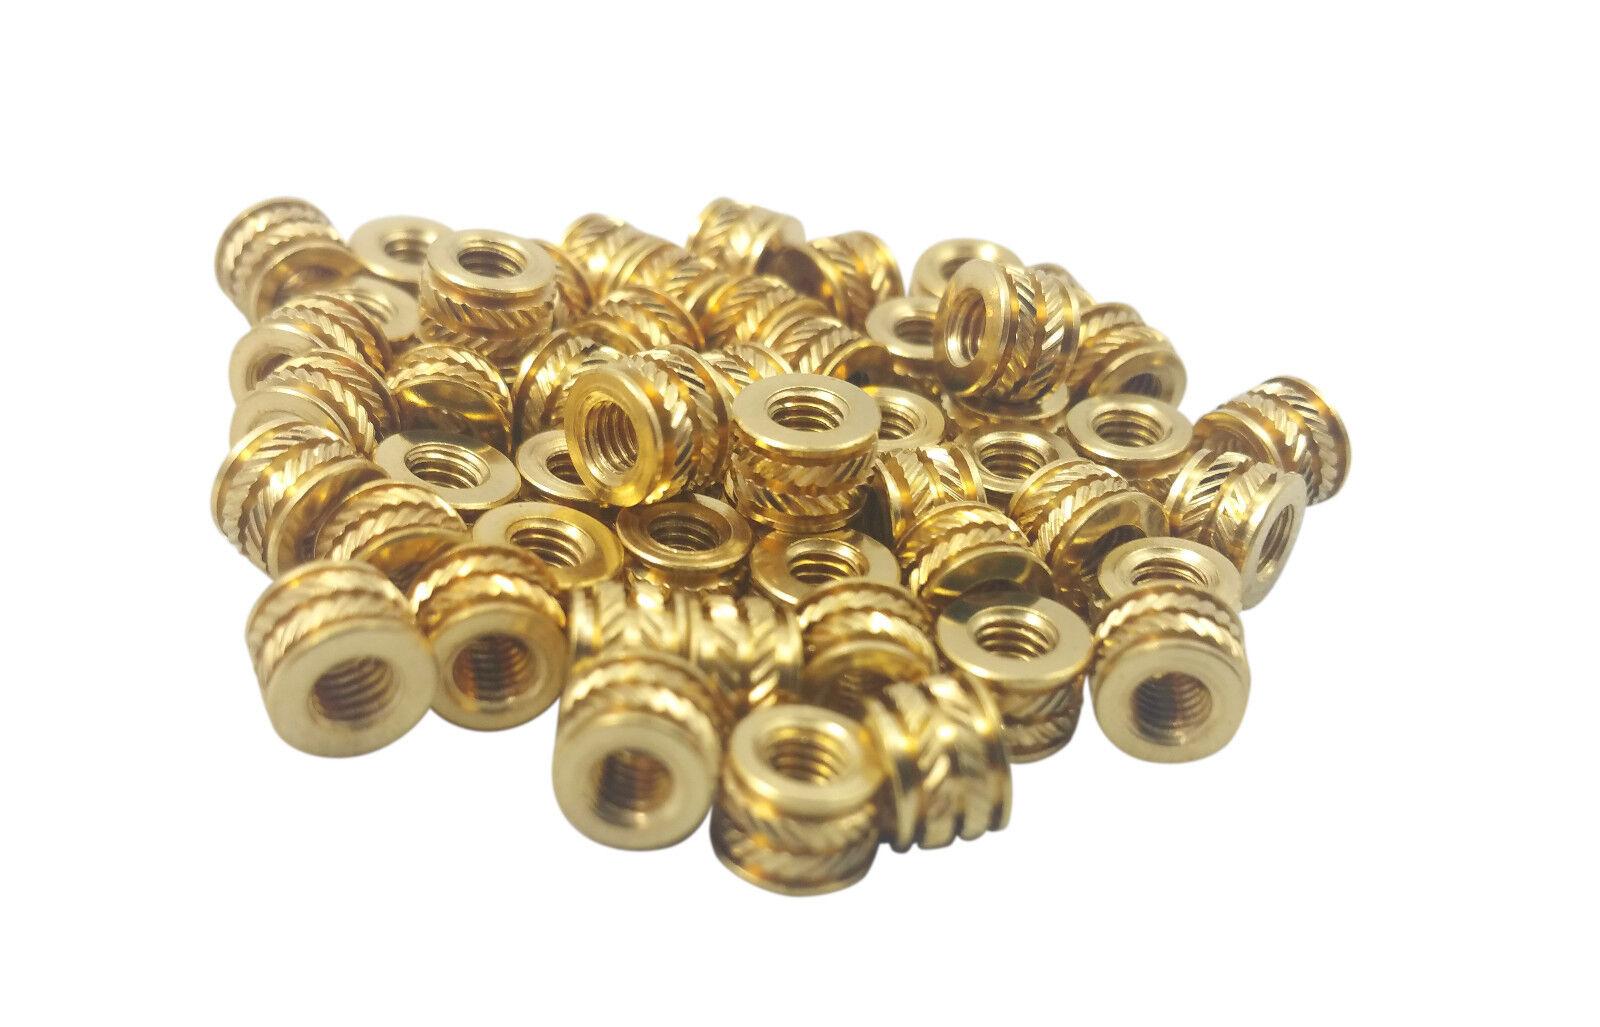 Threaded Heat,M3 3mm M3-0.5 Brass Threaded Metal Heat Set Screw Inserts for H4O4